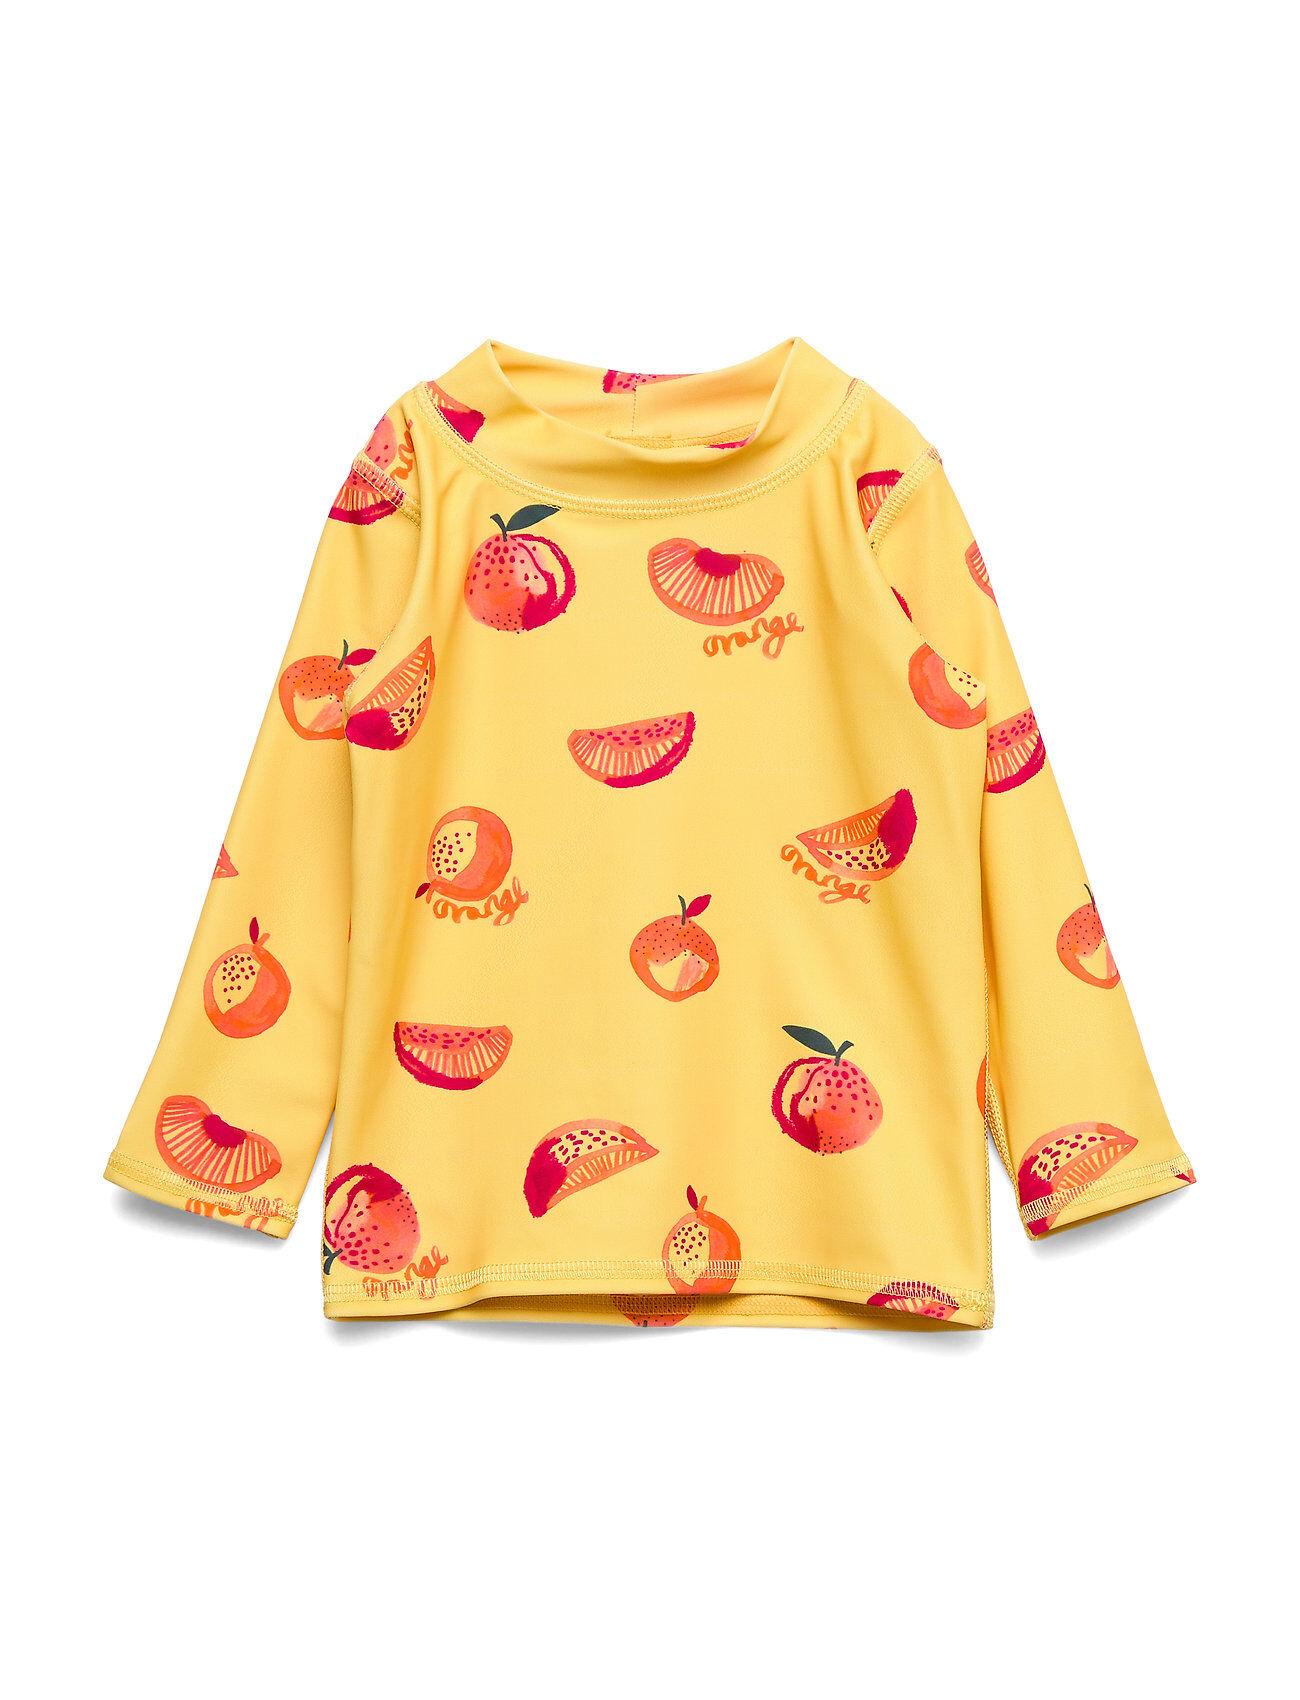 Image of Soft Gallery Baby Astin Sun Shirt Swimwear UV Clothing UV Tops Keltainen Soft Gallery